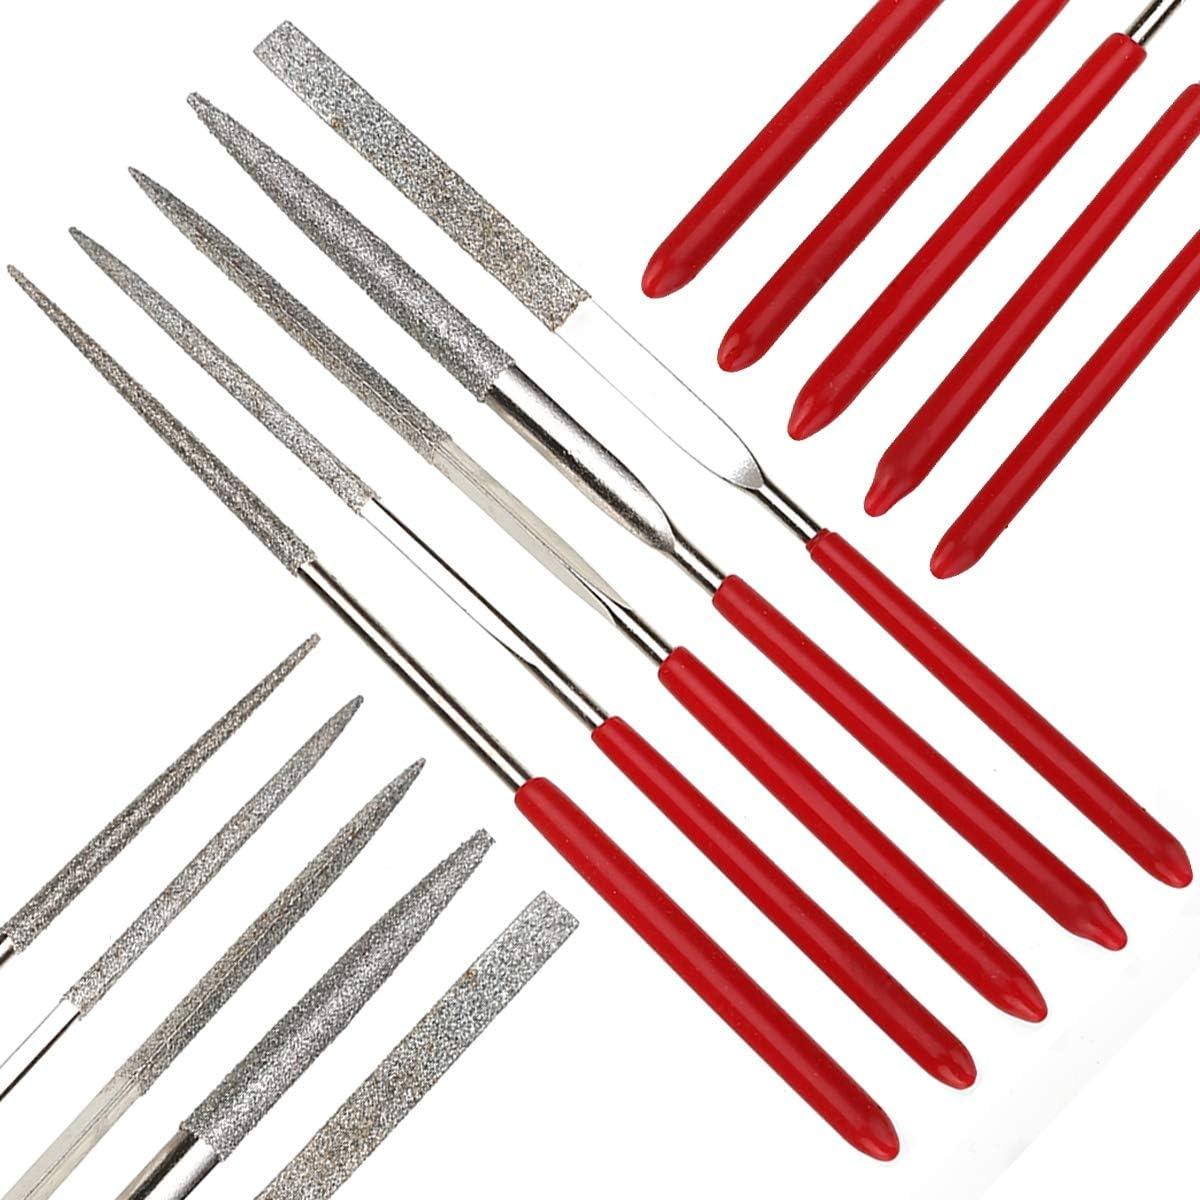 Wang shufang WSF-Adapters 5pcs 140mm Mini Metal Needle File Set Multi Glass Stone Wood Carving Cutting Files Diamond Needle File DIY Woodworking Hand Tool